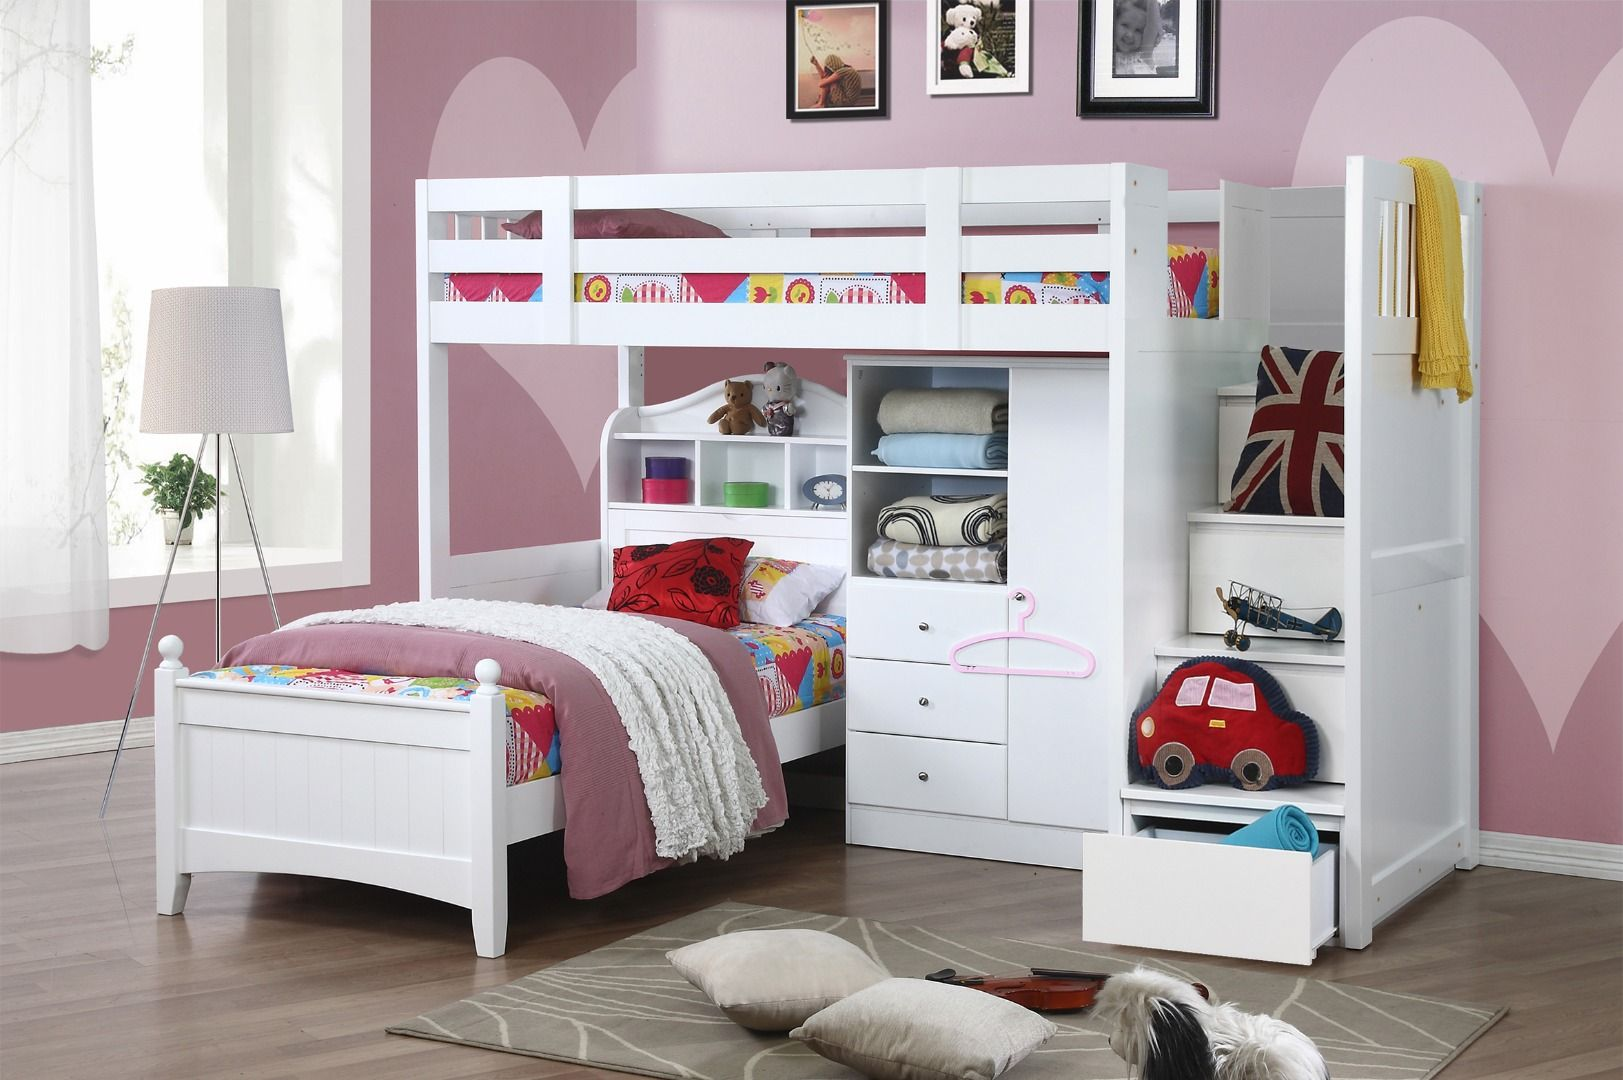 Neutron High Sleeper With Stair Storage Kids bunk beds